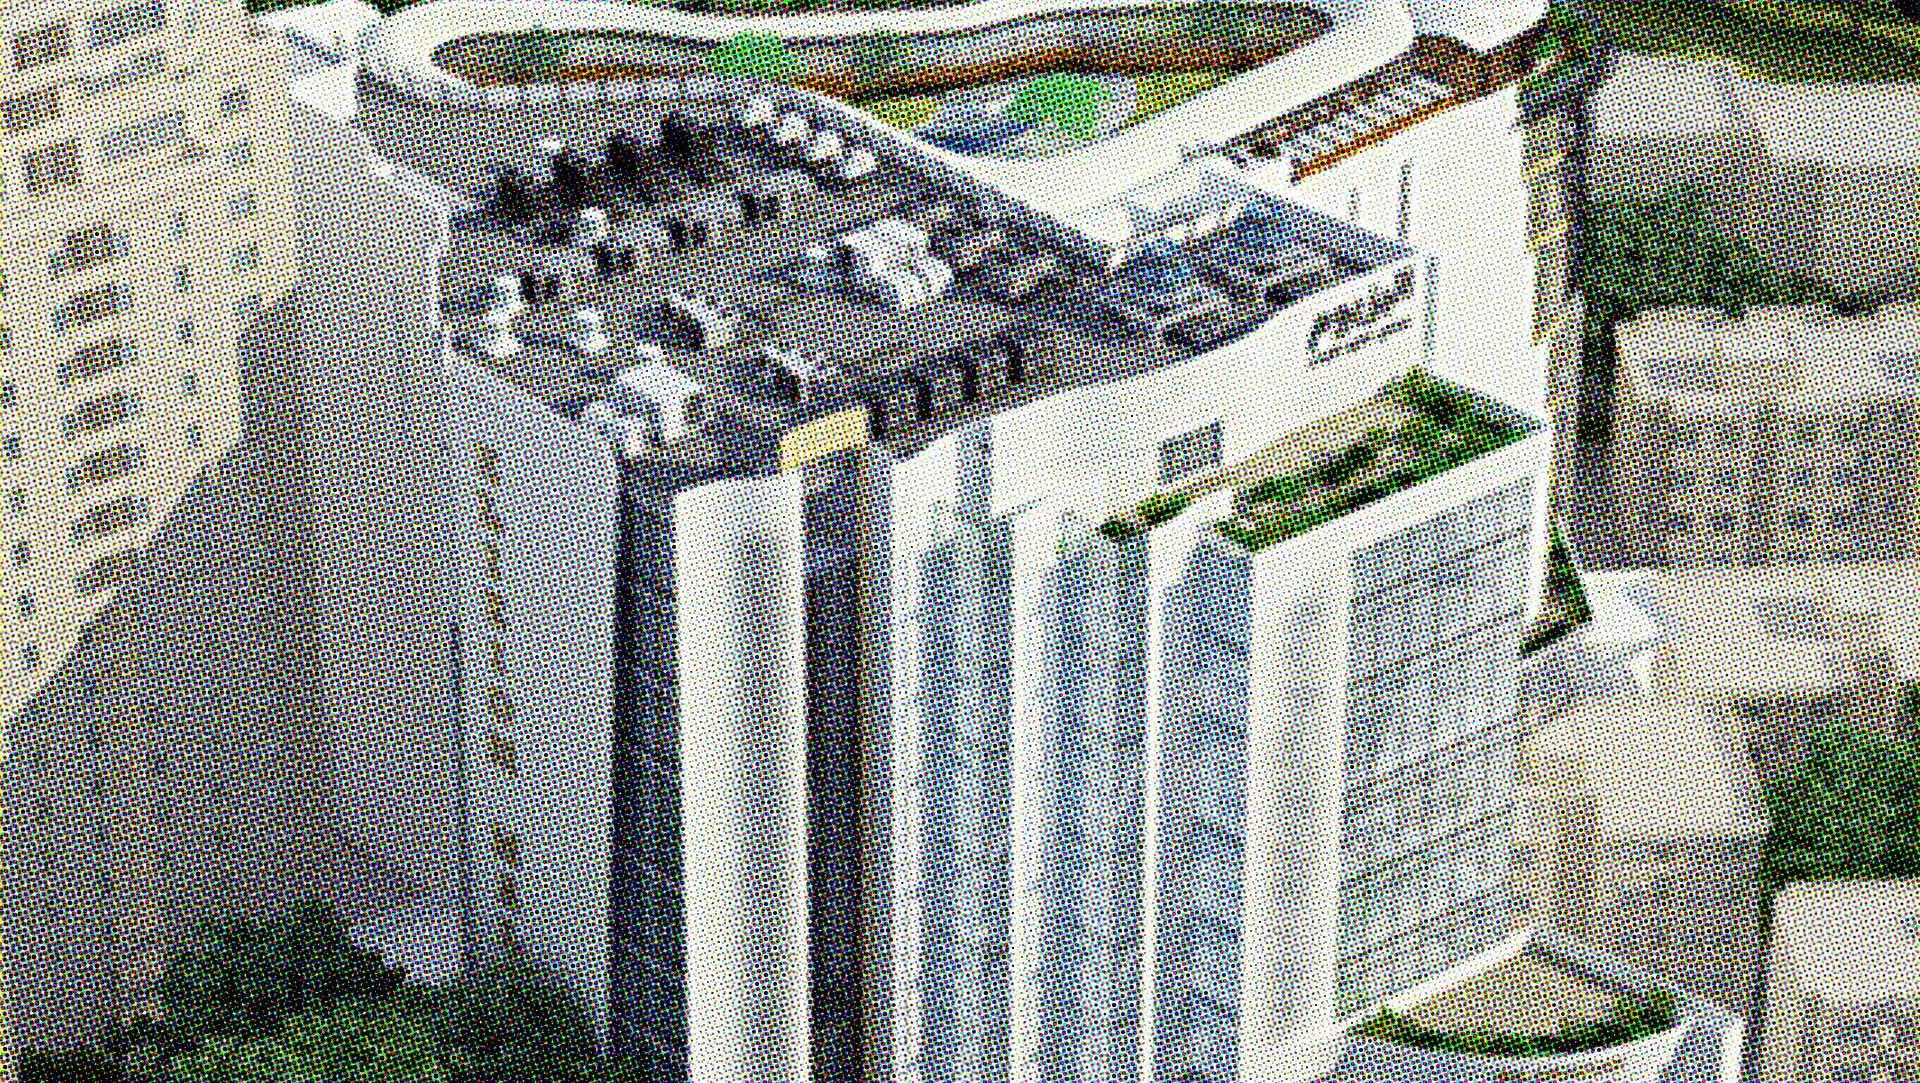 Elysium Mall - Design Electrical Blueprints, Construction